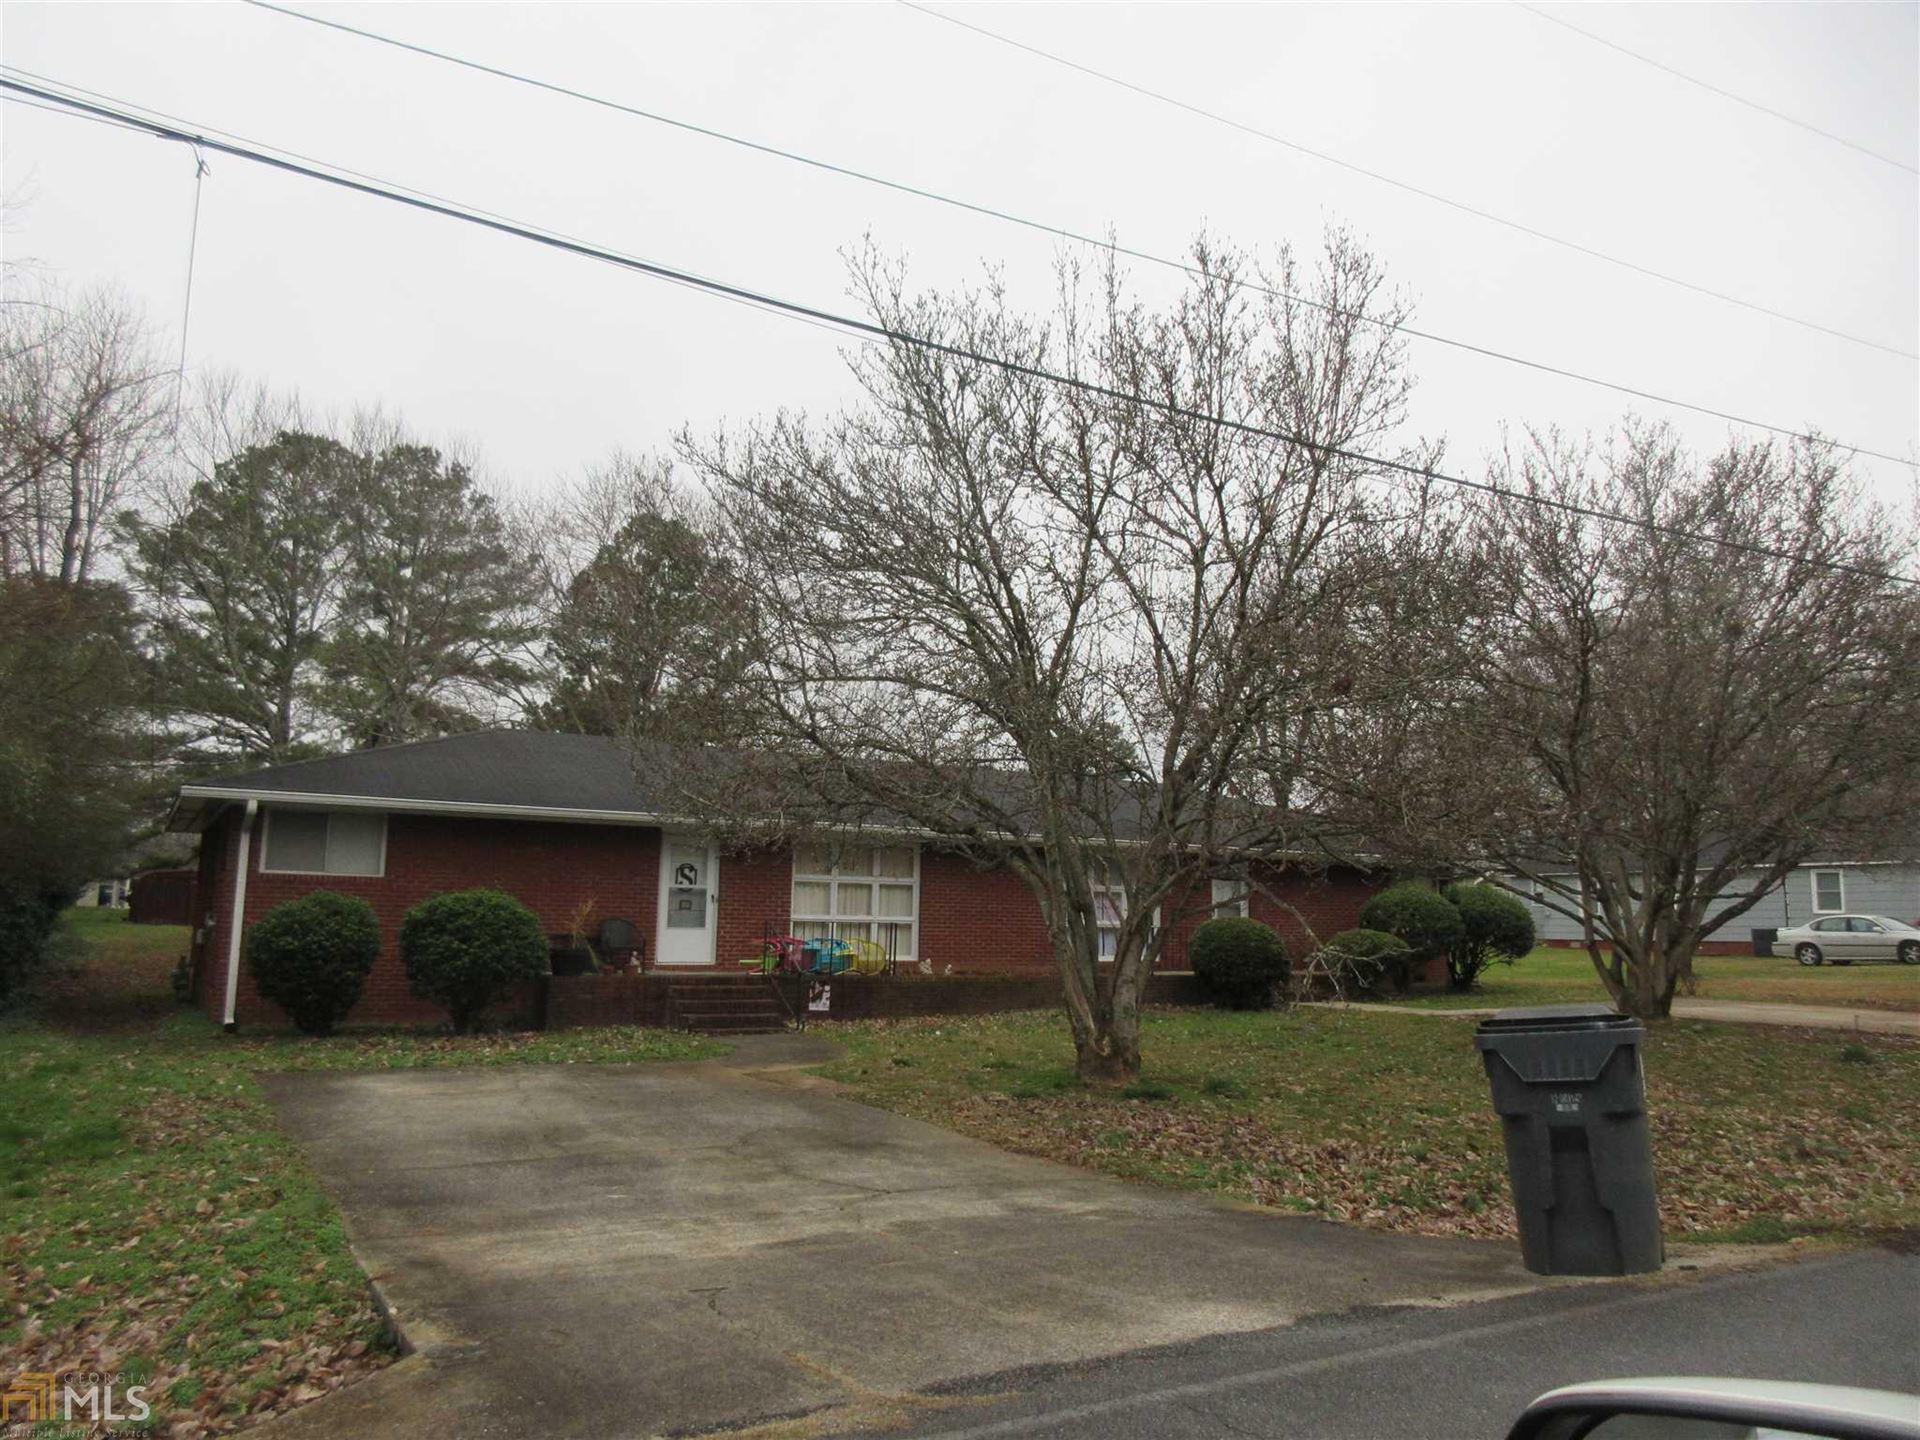 809 Montgomery Ave, Cedartown, GA 30125 - #: 8732754